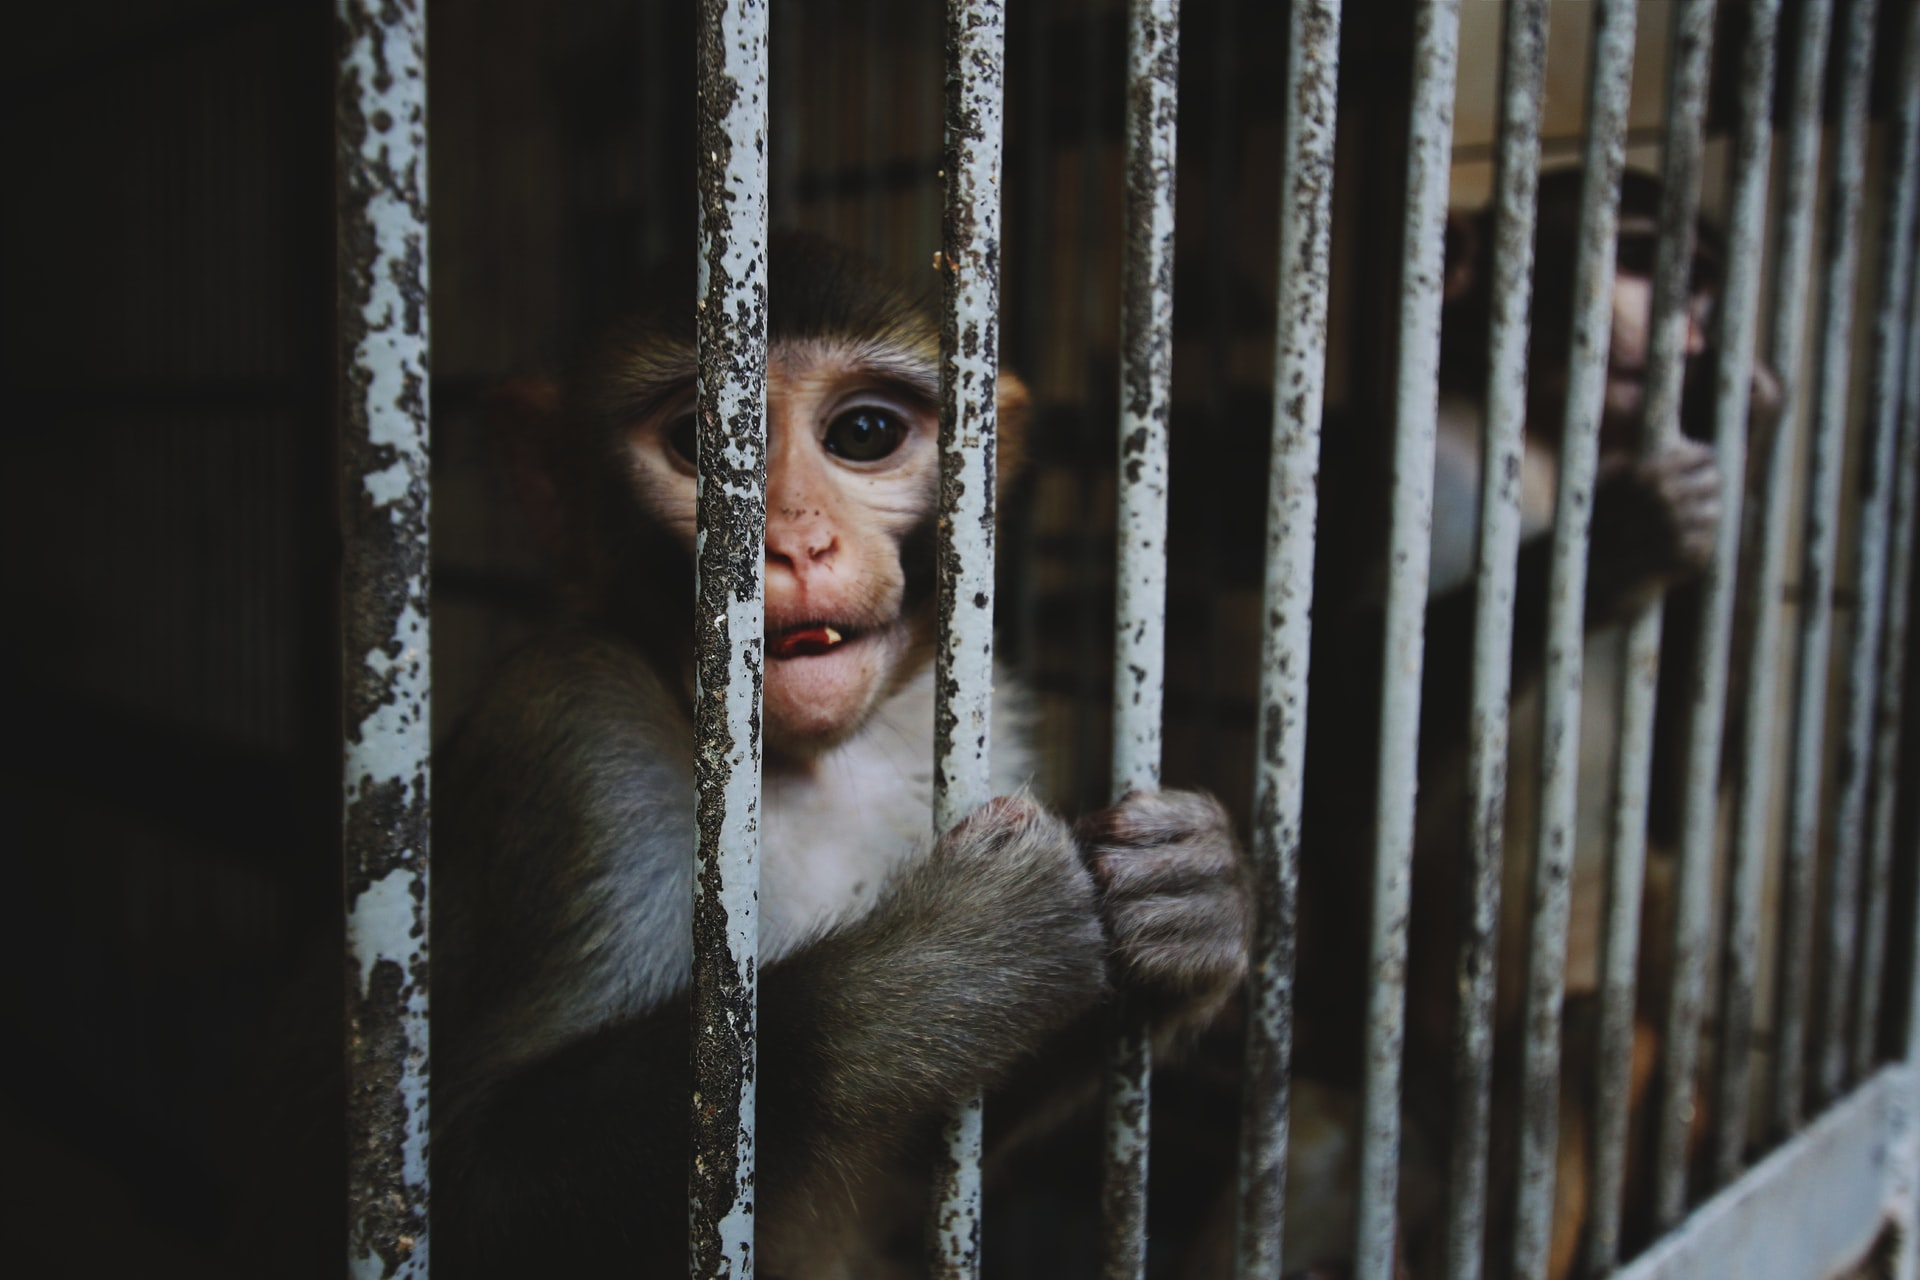 animal activists